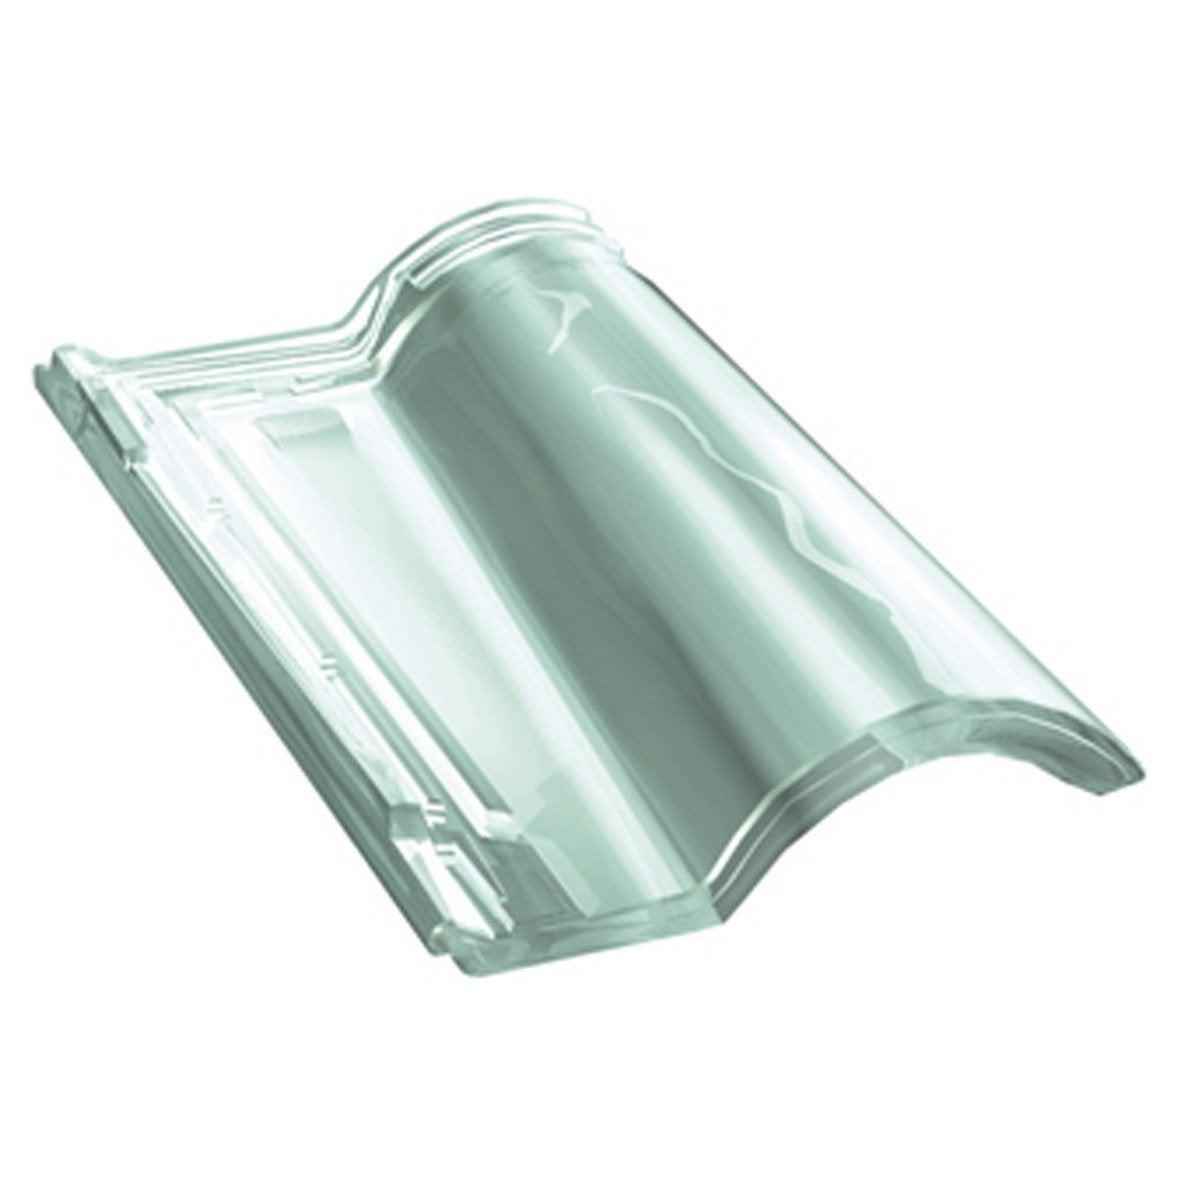 Tuile d 39 clairement gr13 monier translucide leroy merlin - Tuile en verre leroy merlin ...